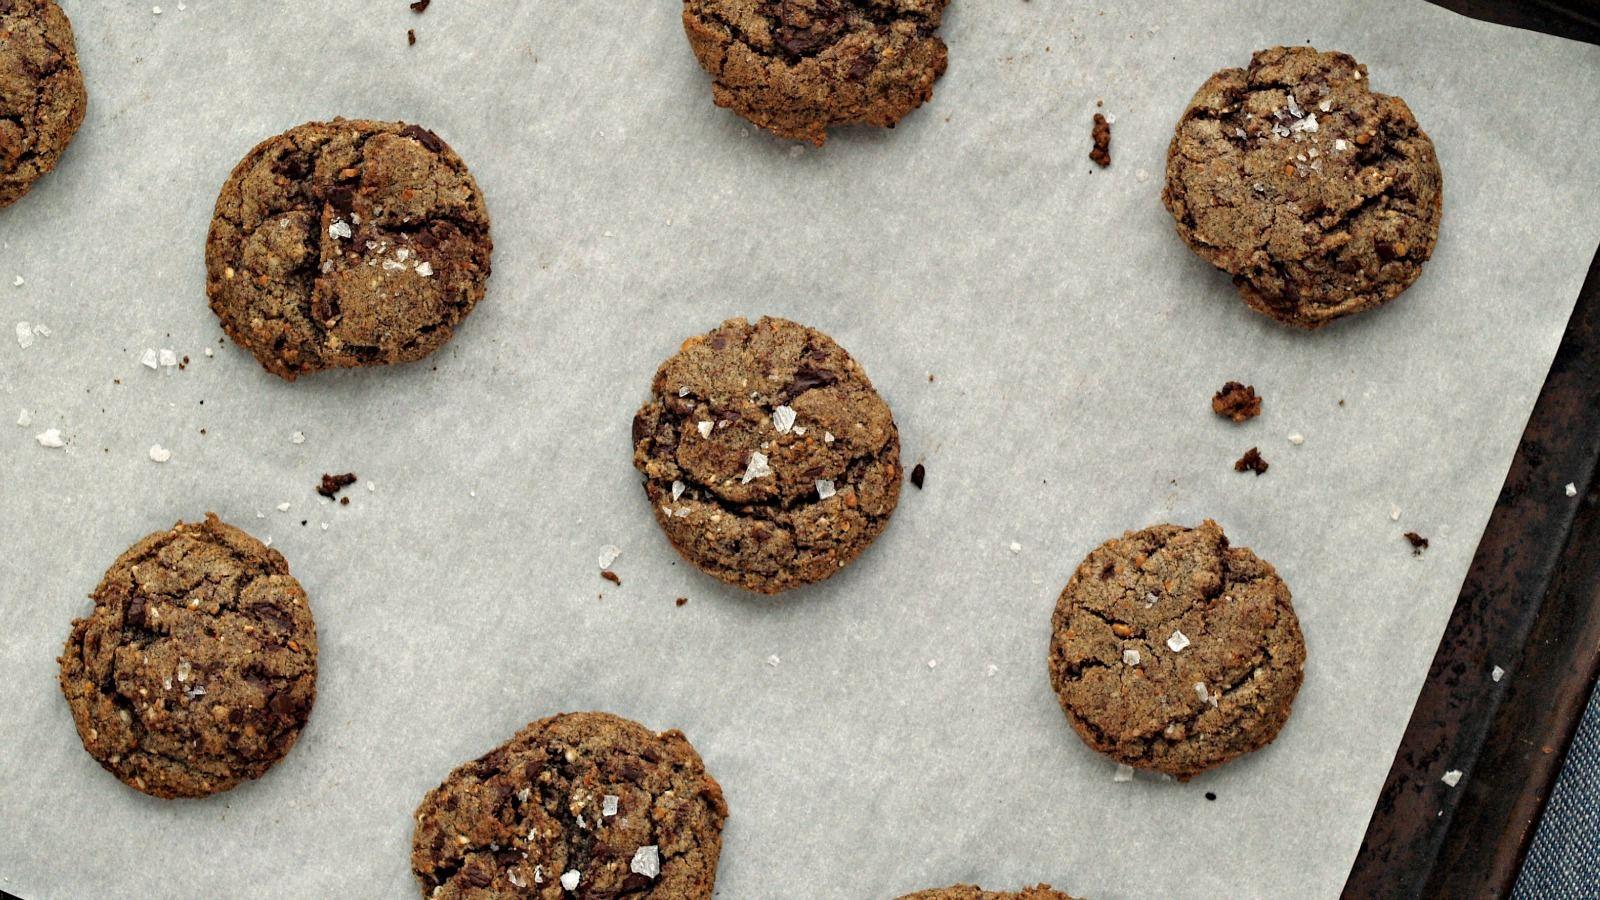 Multigrain Chocolate Chip Cookies from 'Dorie's Cookies.'